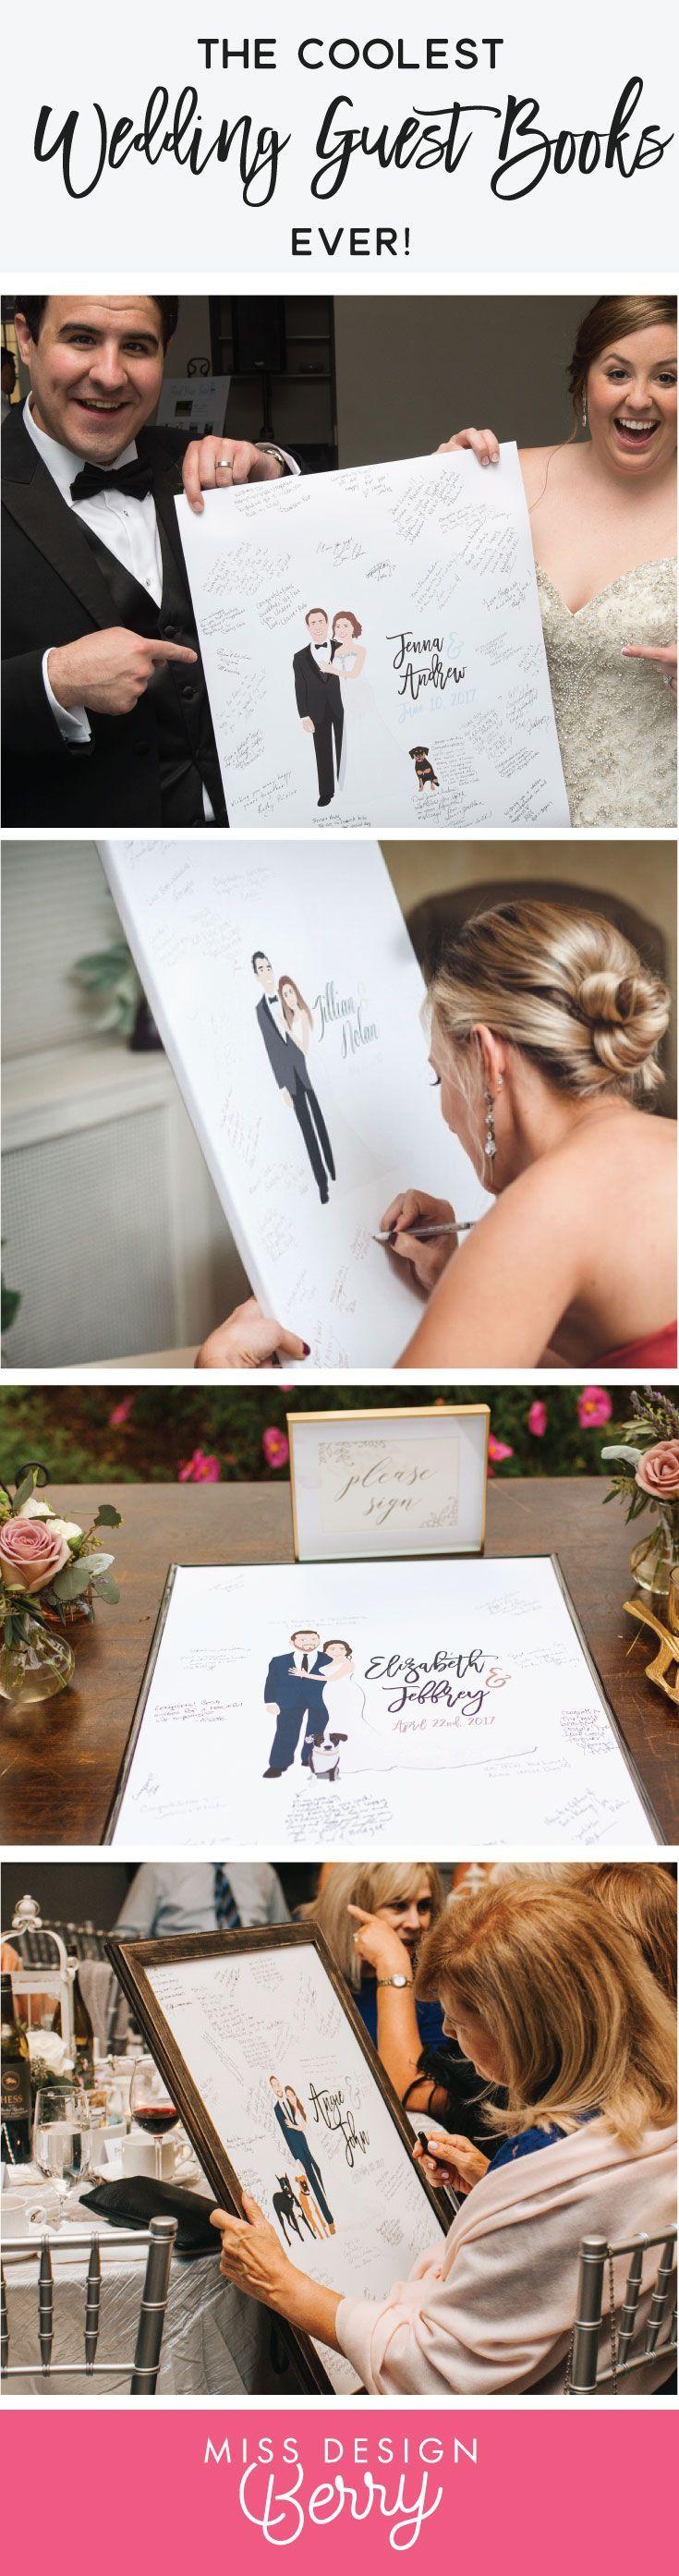 The COOLEST wedding guest book alternatives EVER. Miss Design Berry custom illus...